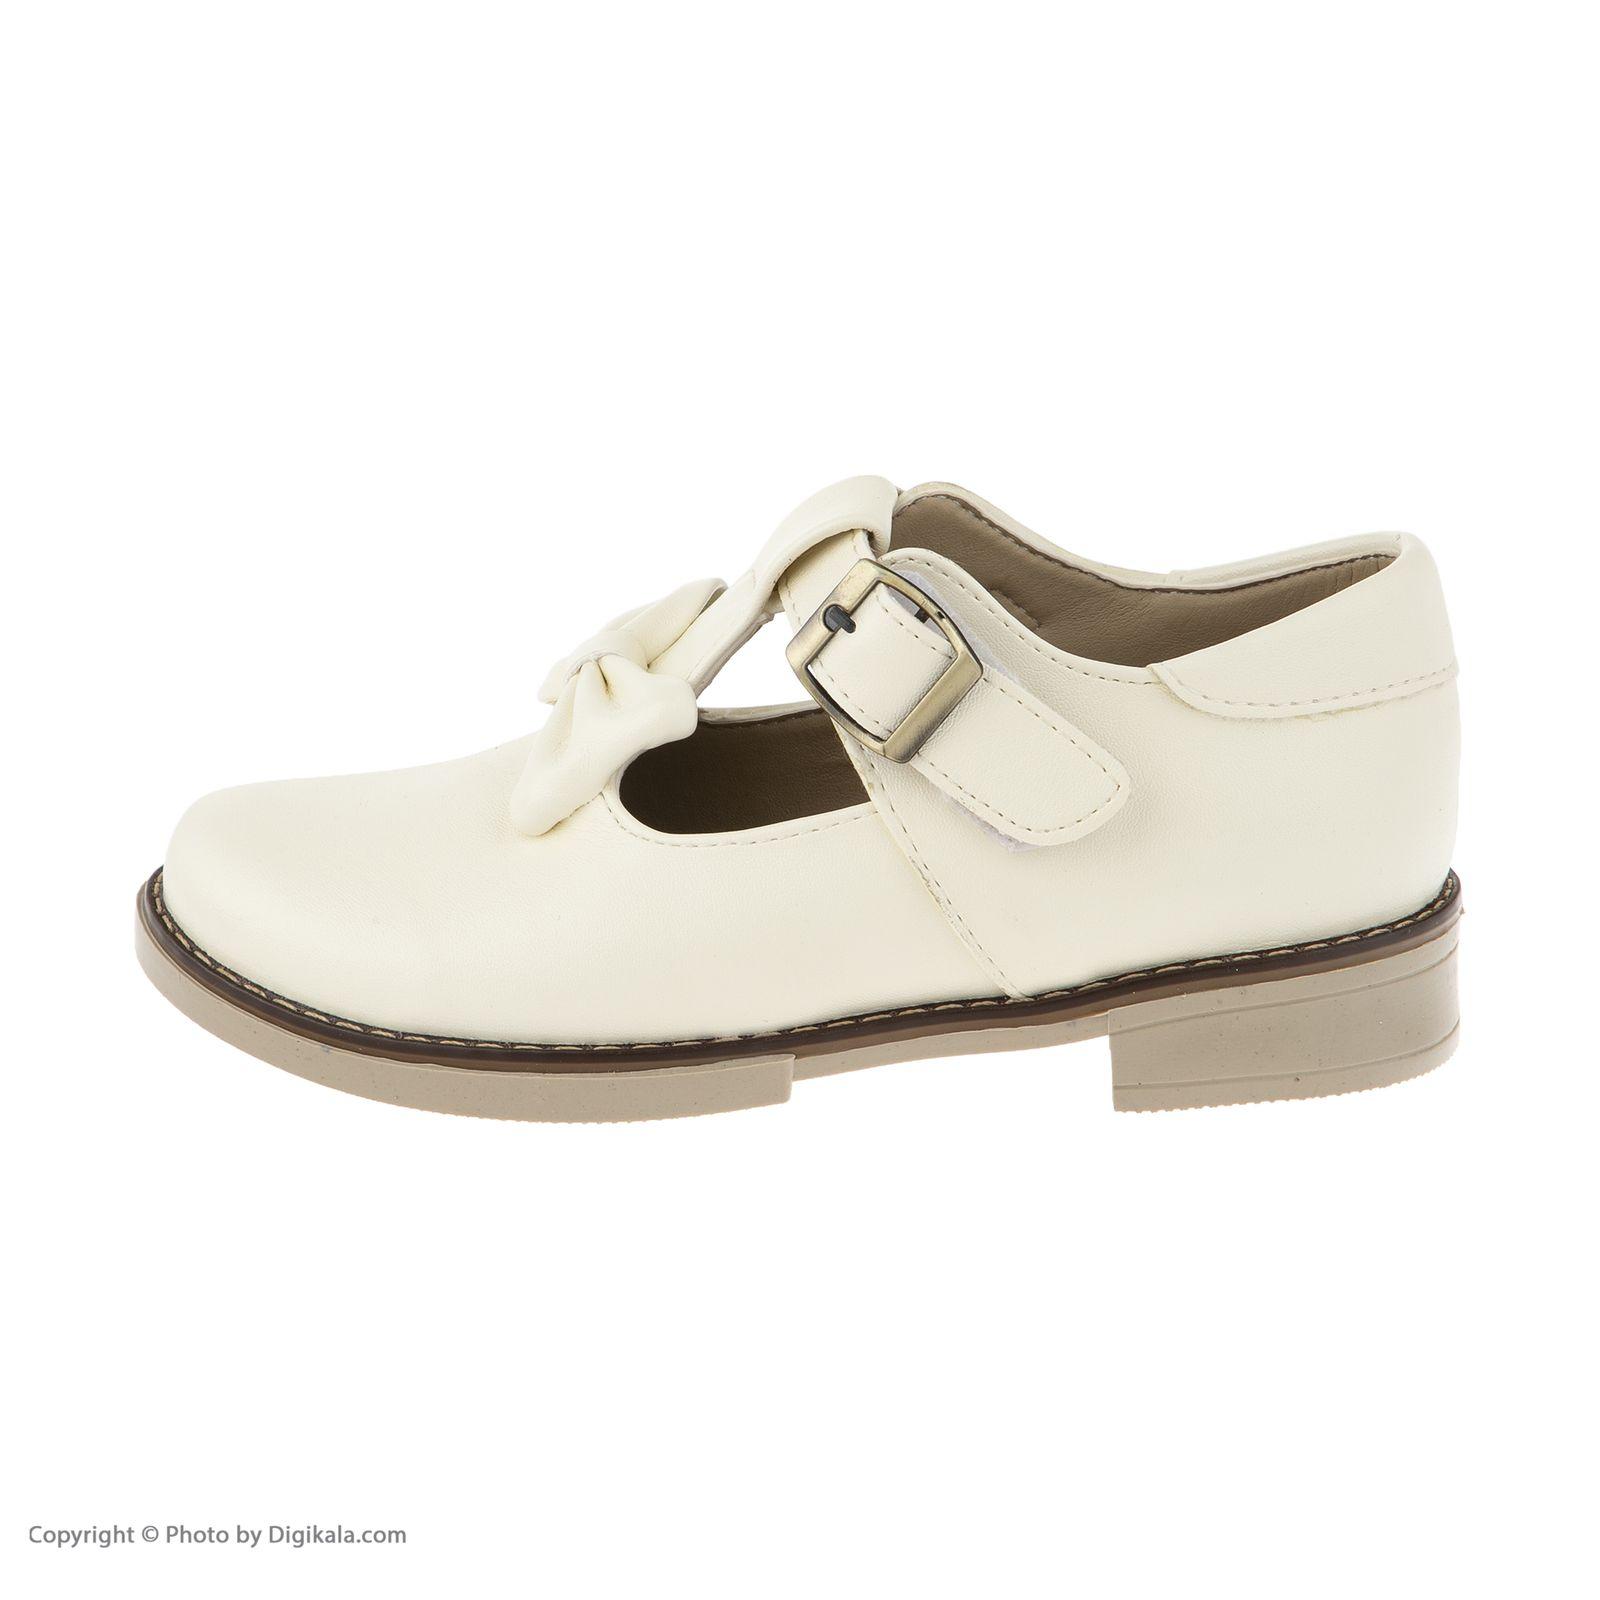 کفش دخترانه کد pa-1034 -  - 1